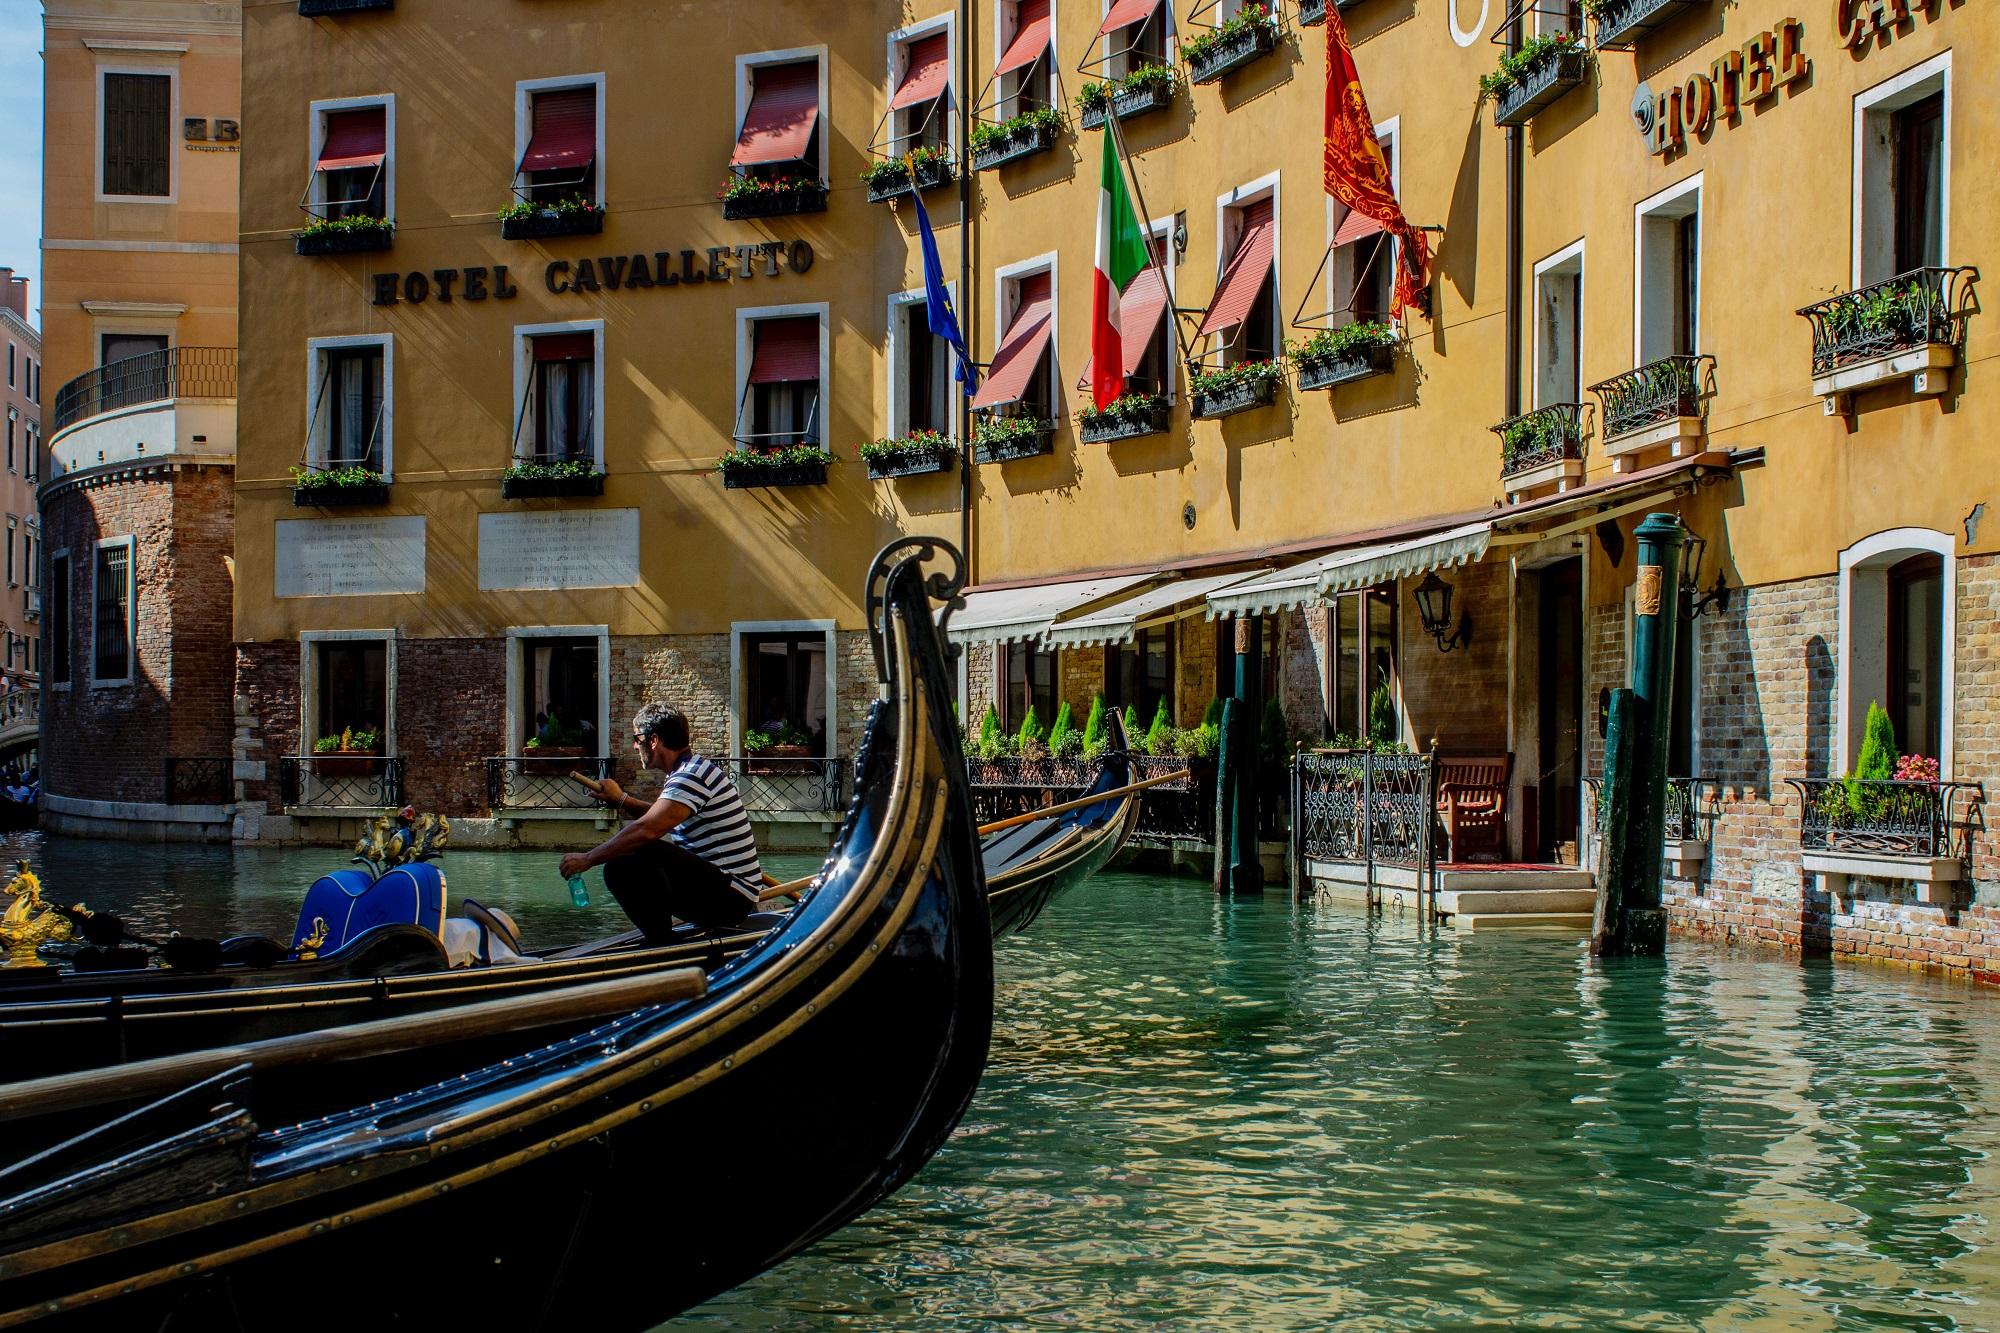 How do people get around Venice?